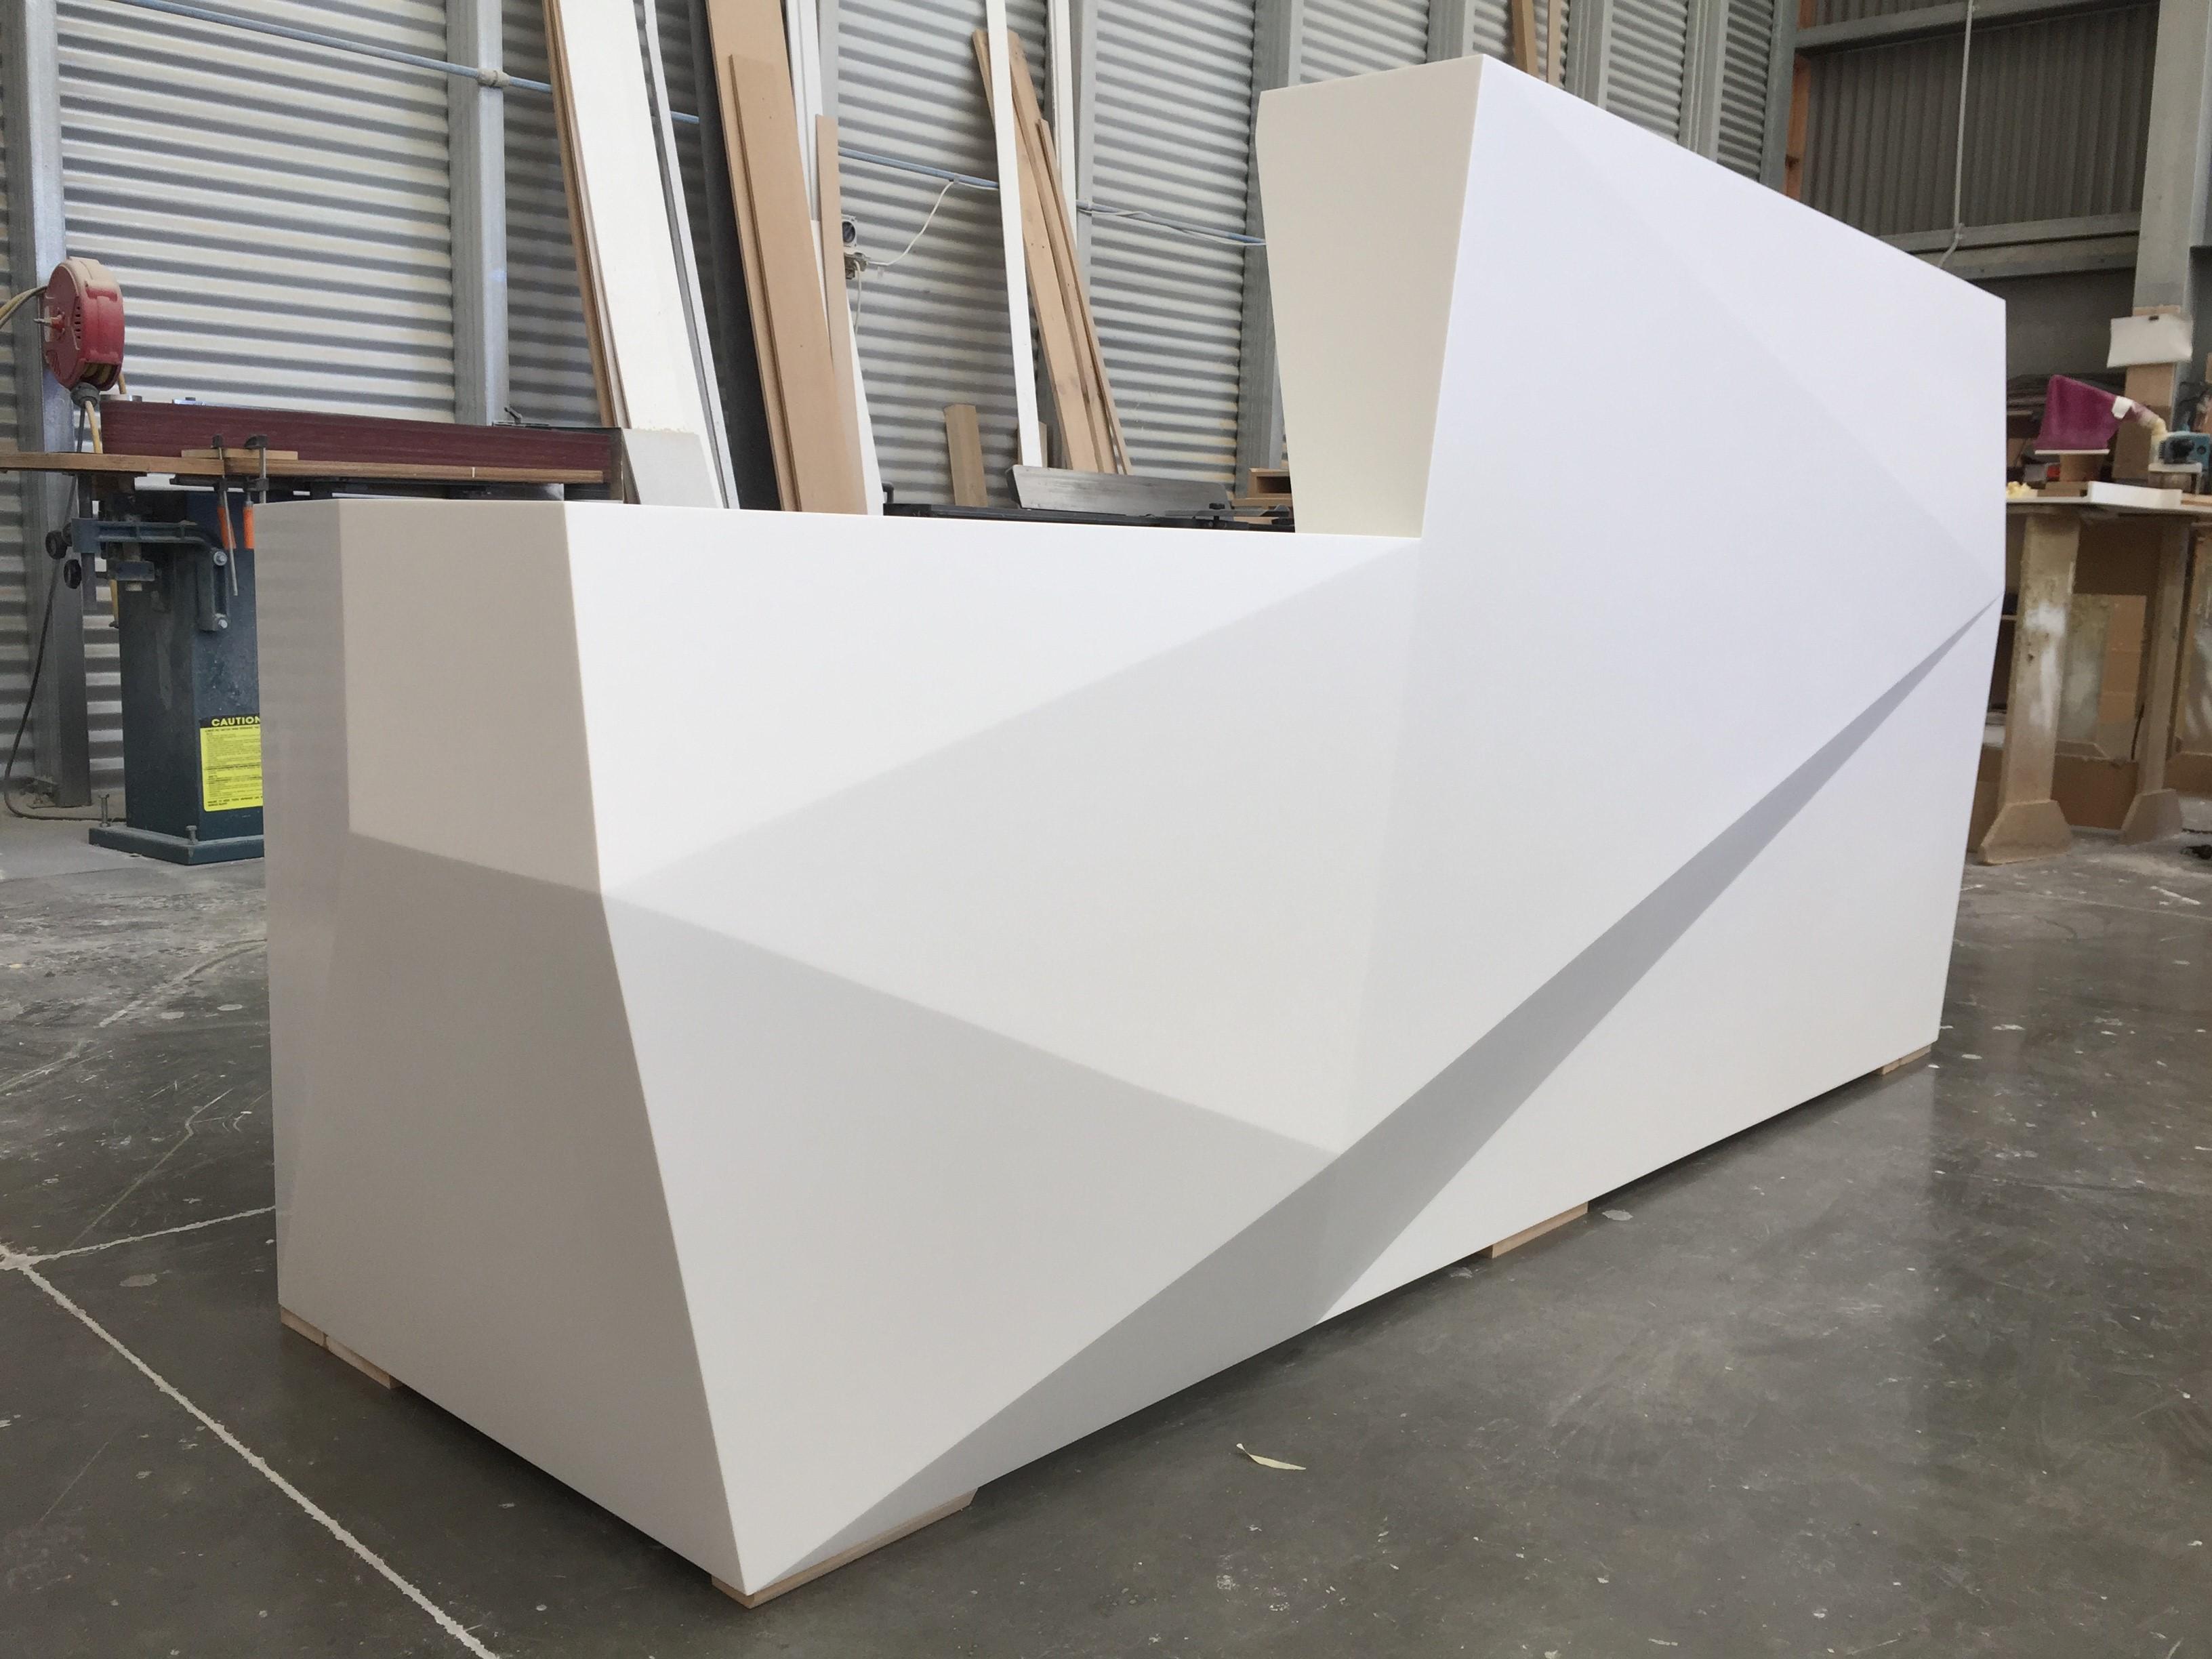 Gallery | Benchtop Concepts Ltd